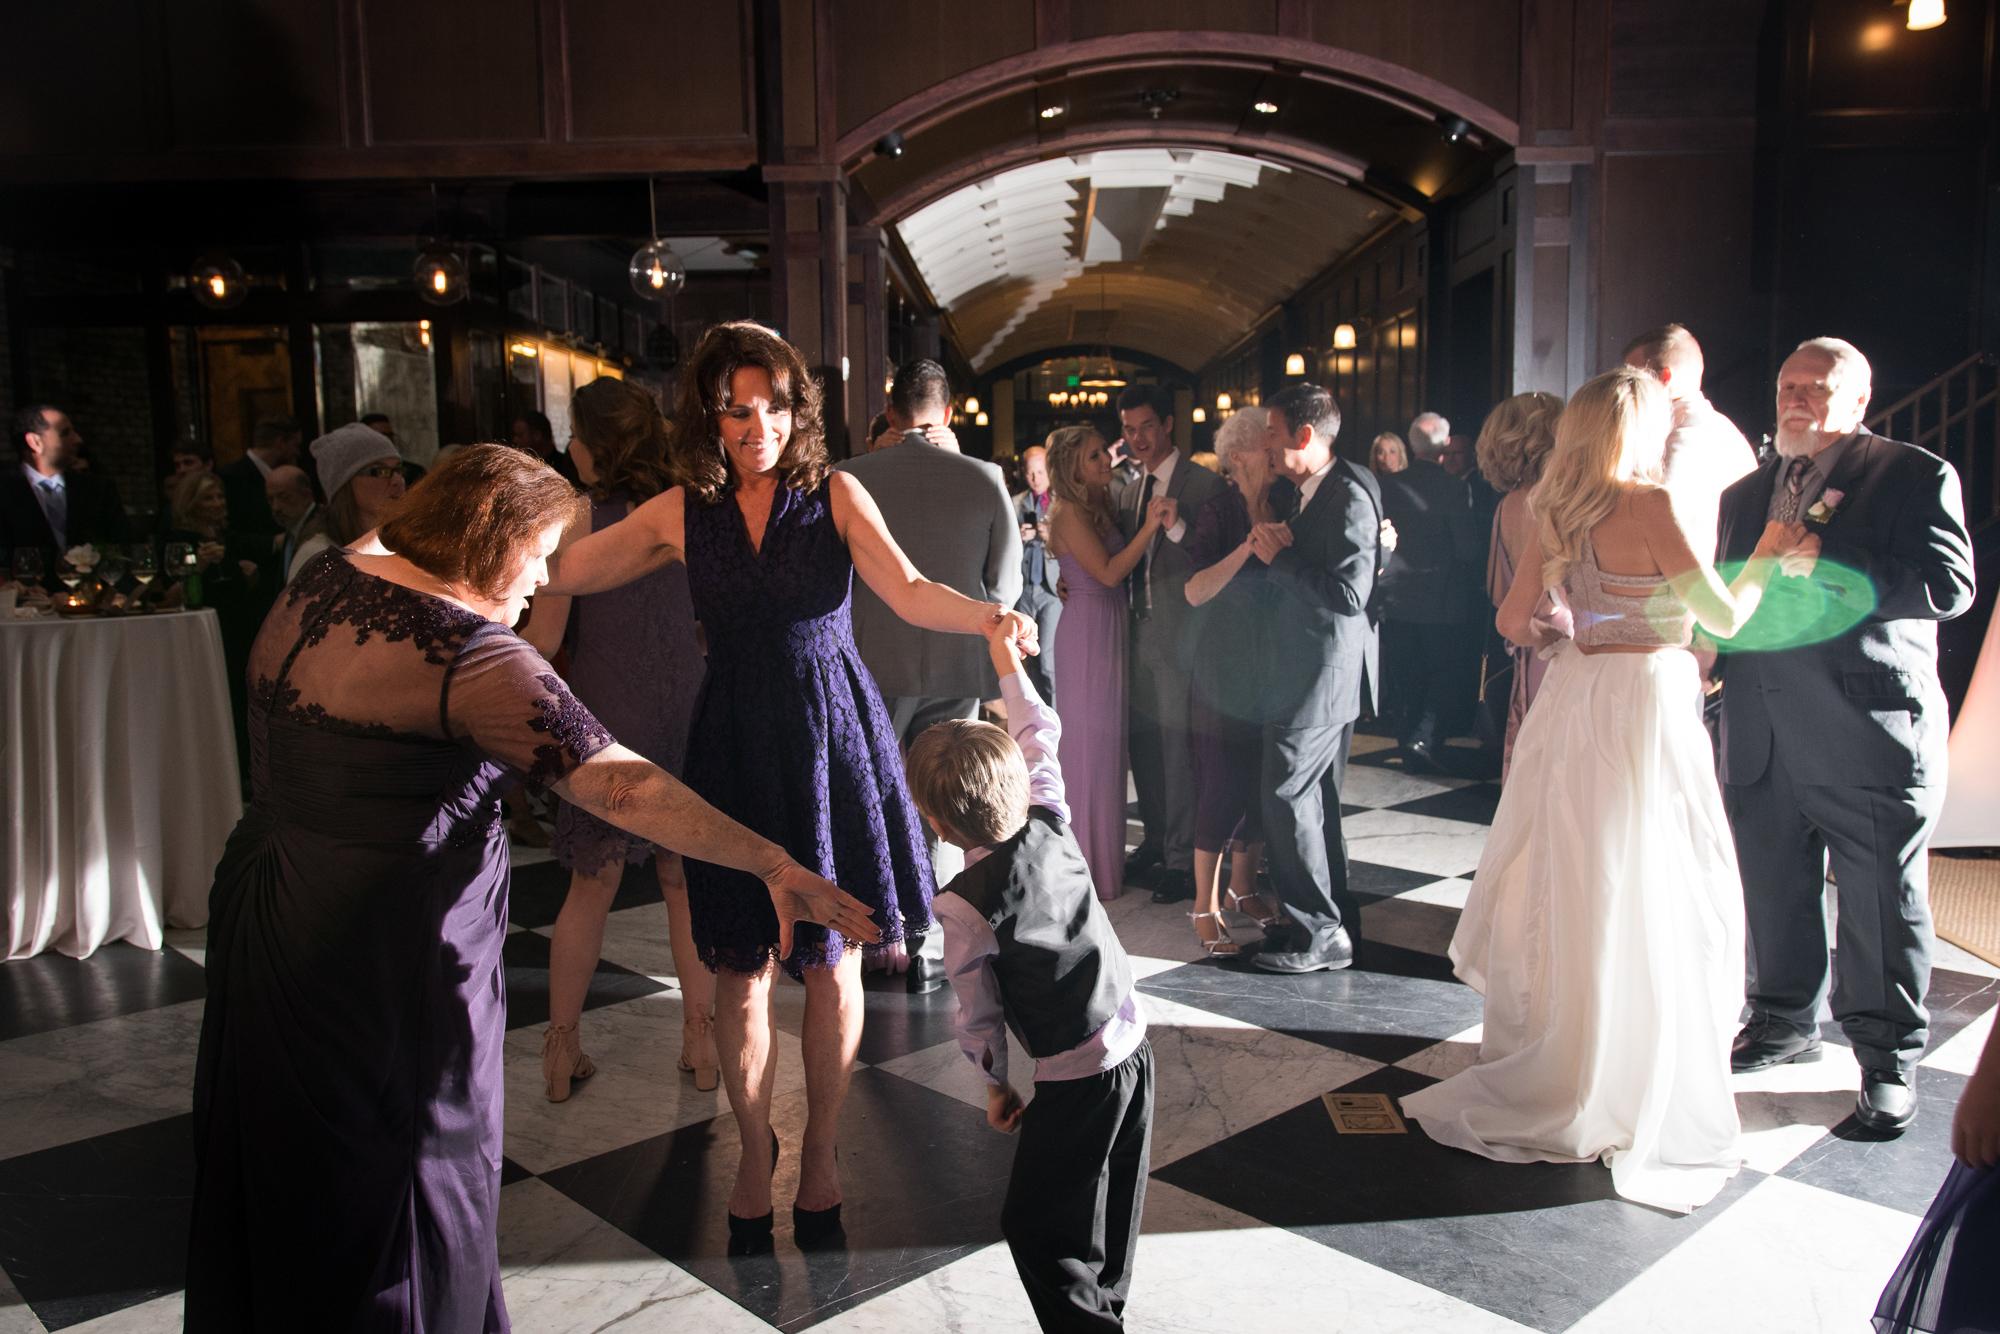 Oxford-Exchange-wedding-photo